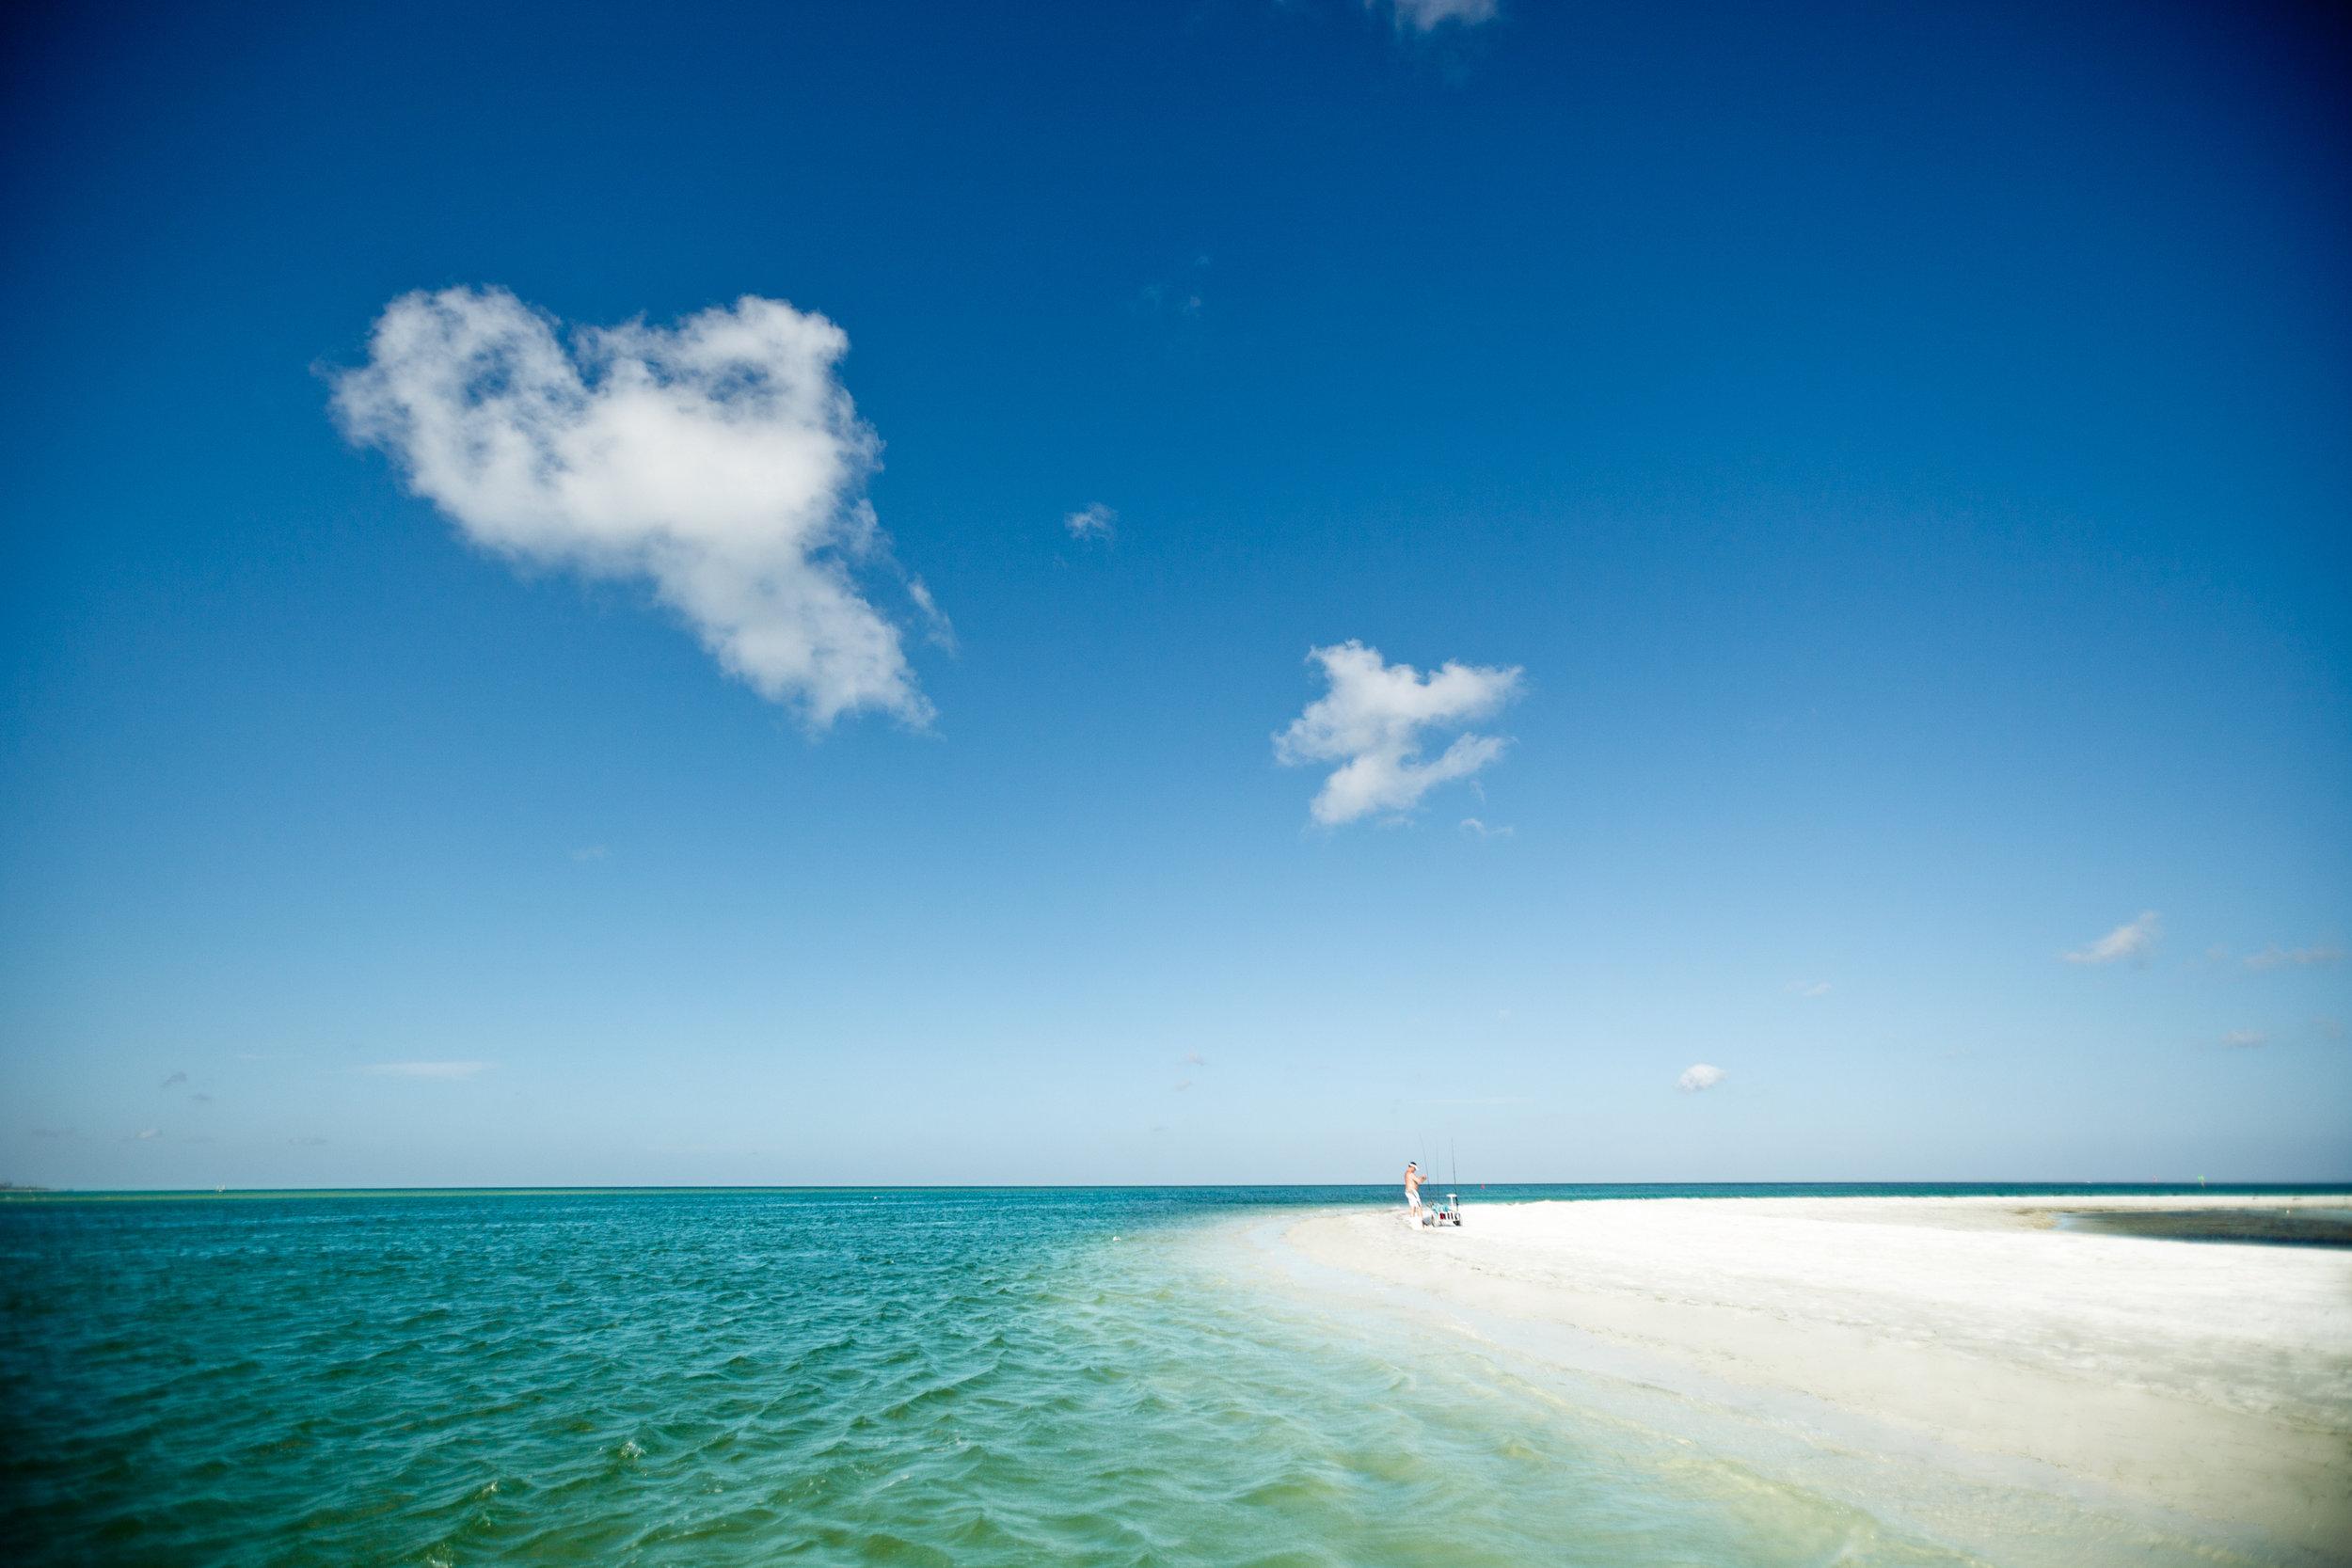 beach_caladesi_S6yVqTMJJtn45sARhrm9Ugq_rgb_l.jpg